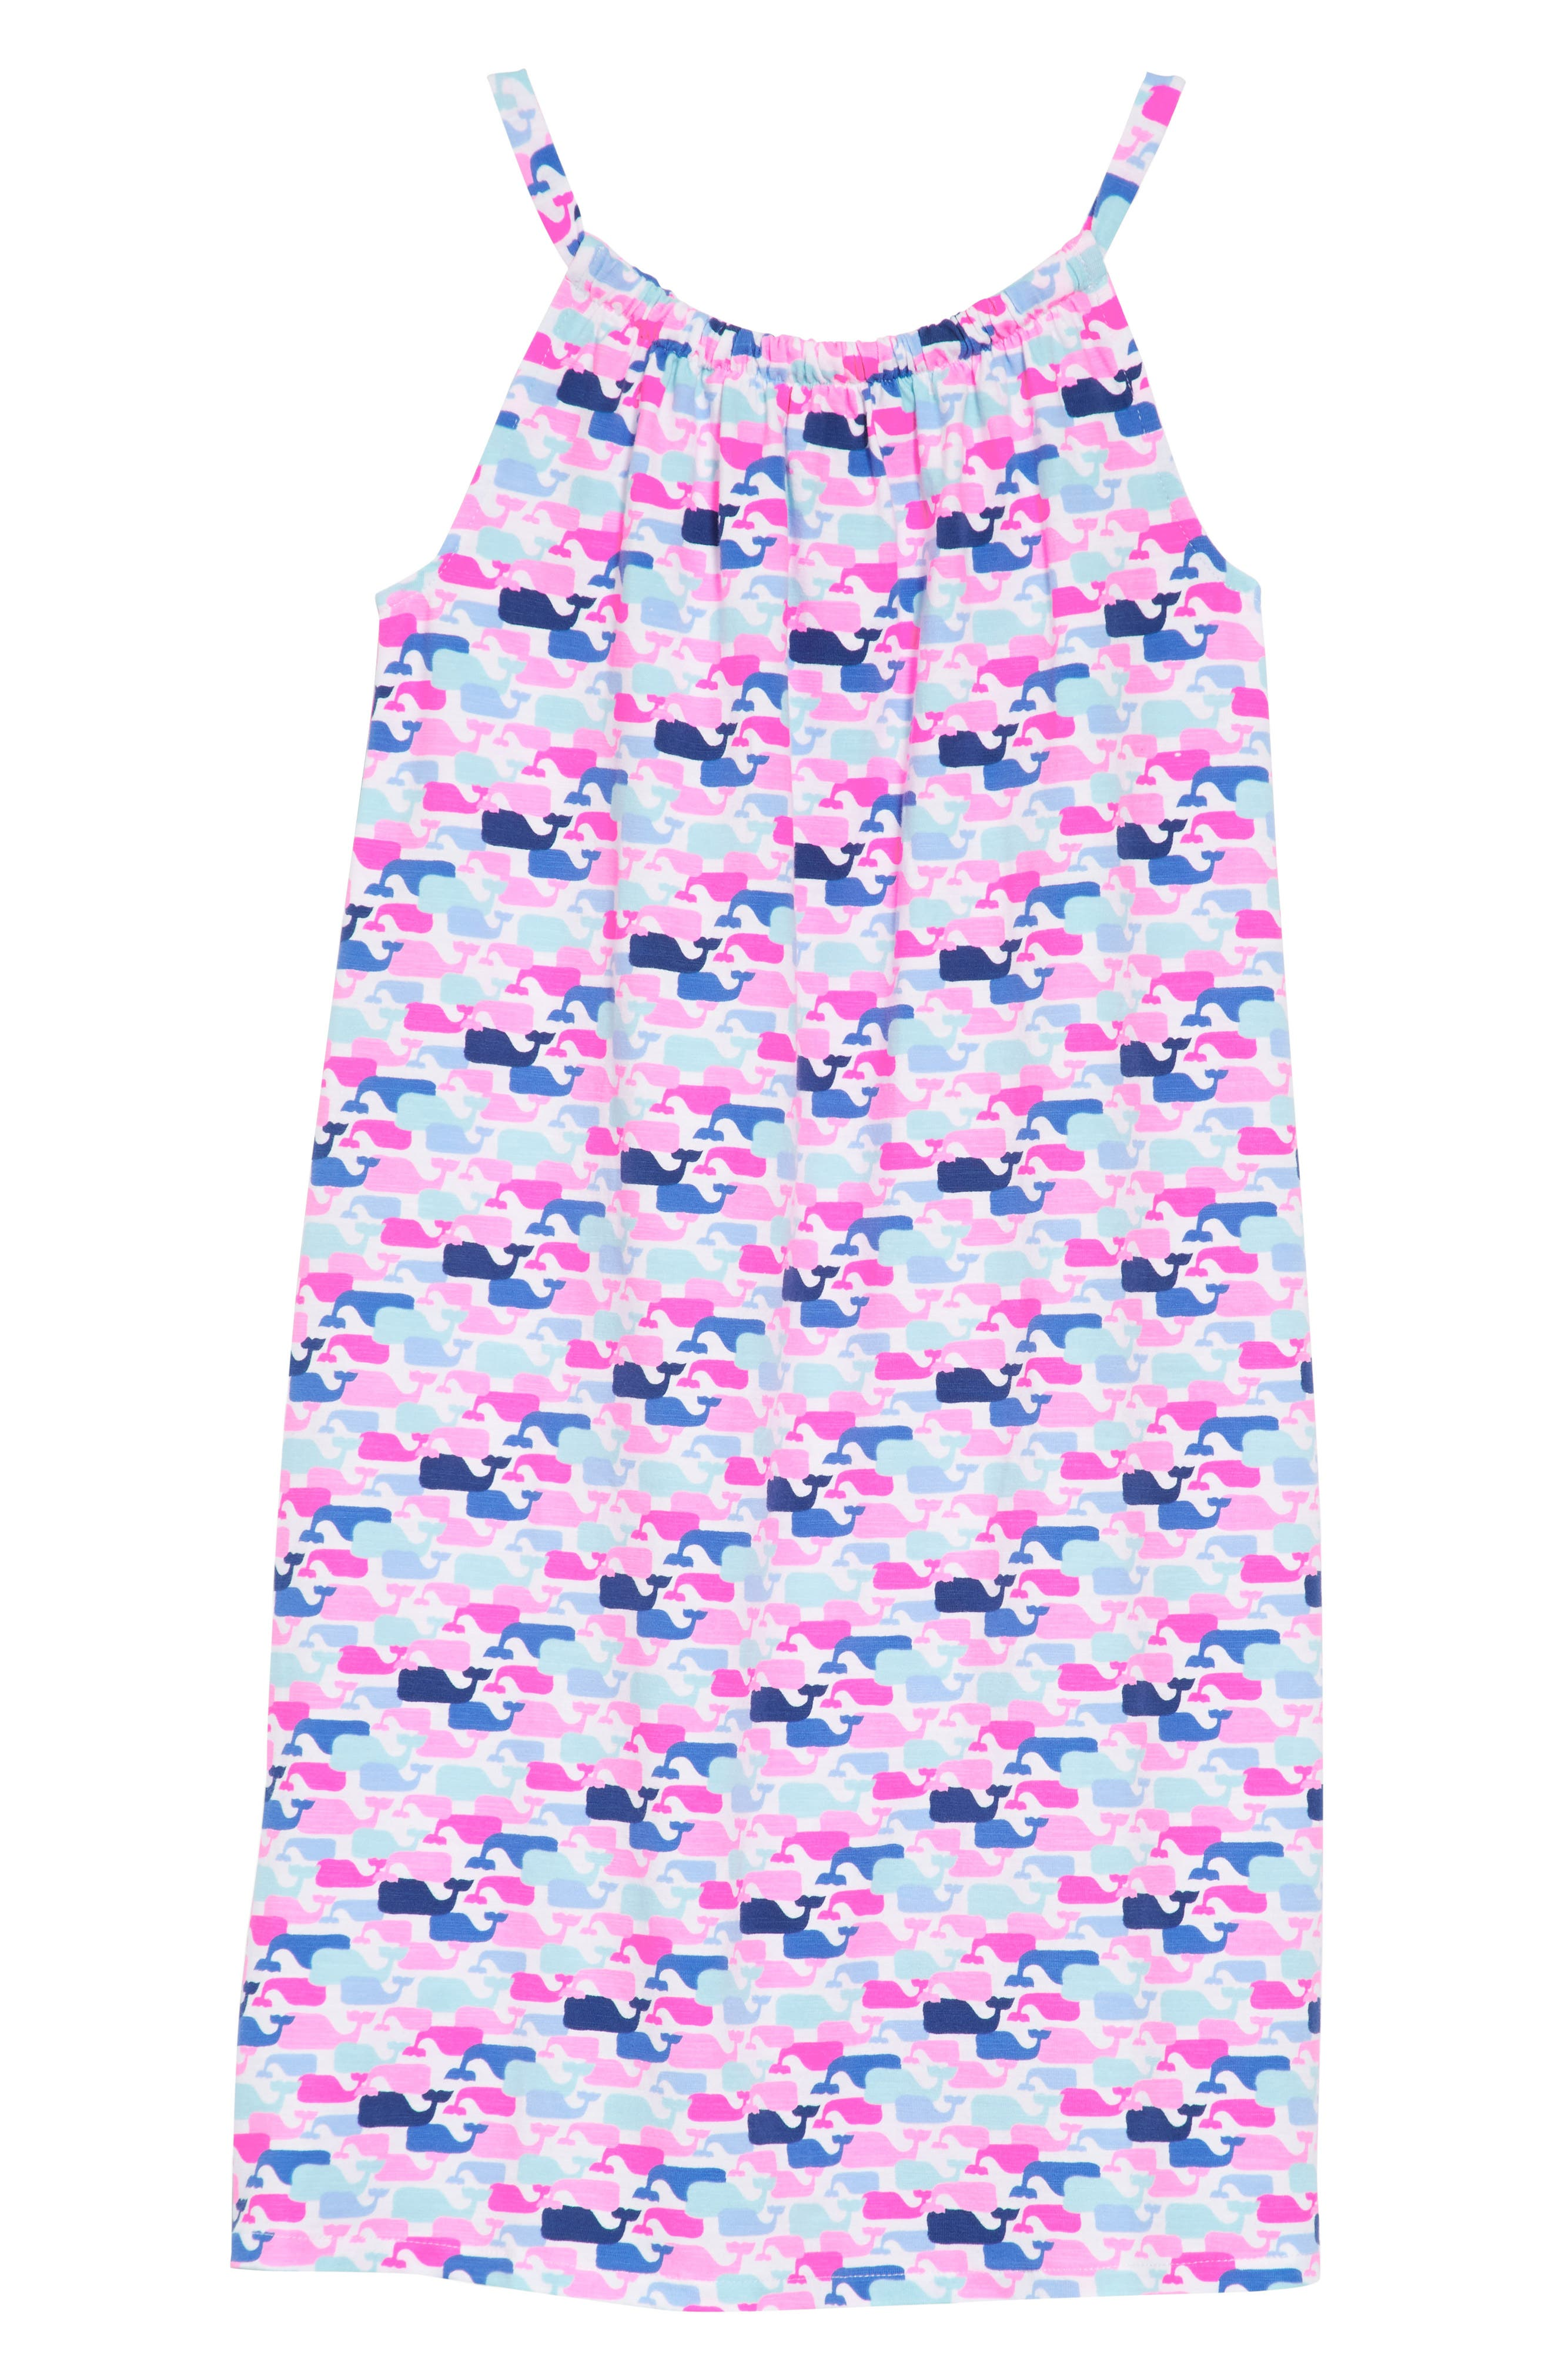 Whale Print Dress,                         Main,                         color, White Cap